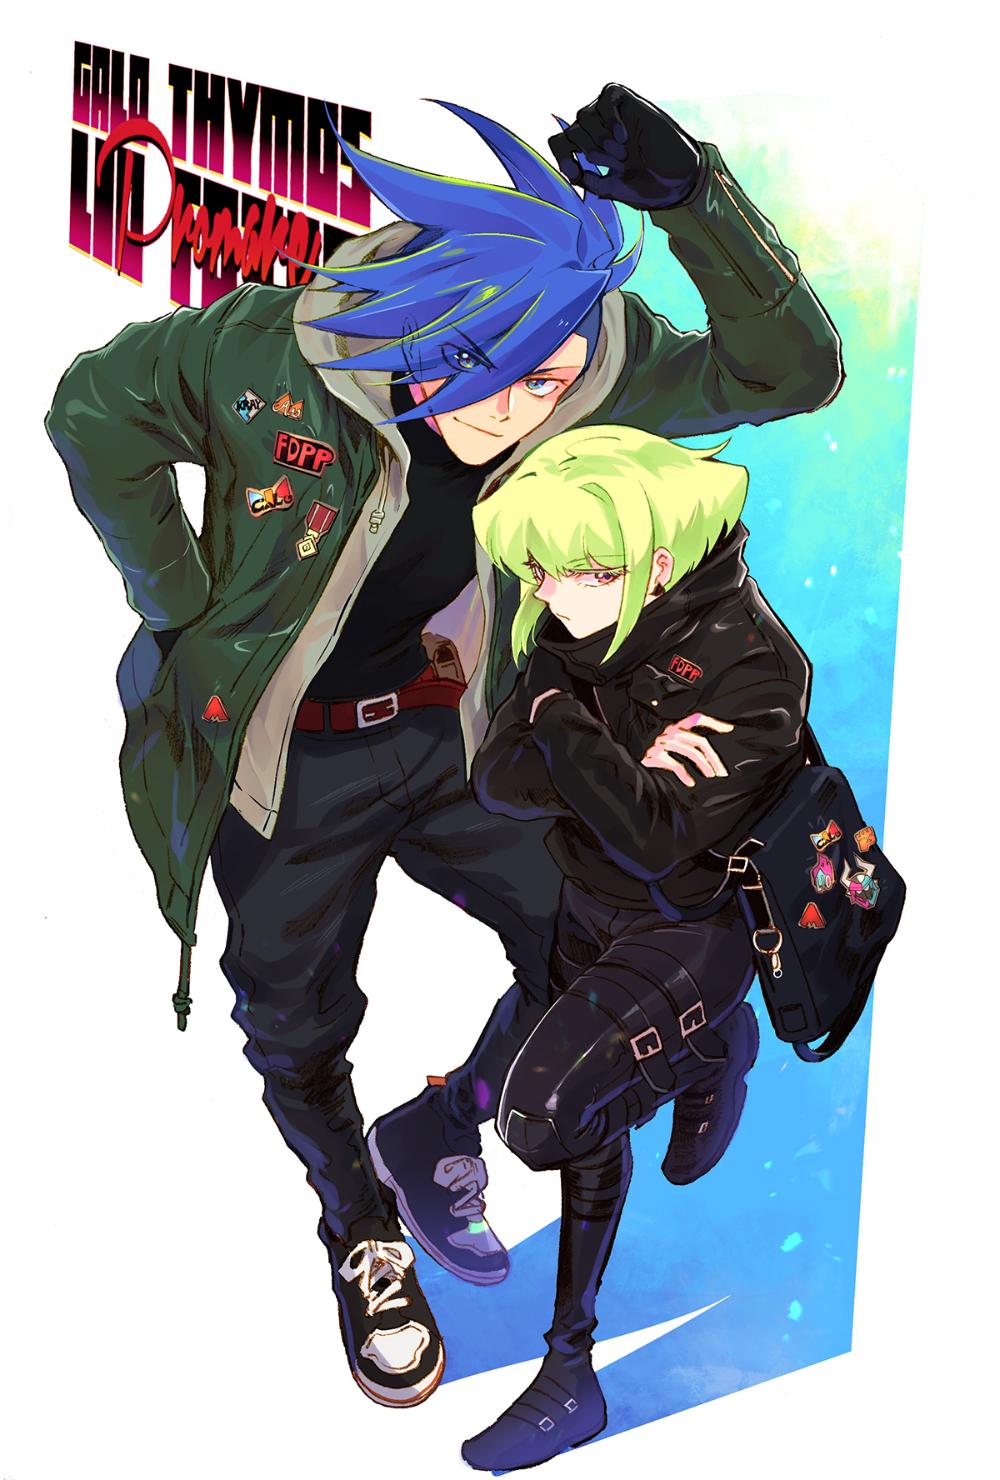 Promare Image 2806468 Zerochan in 2020 Anime images